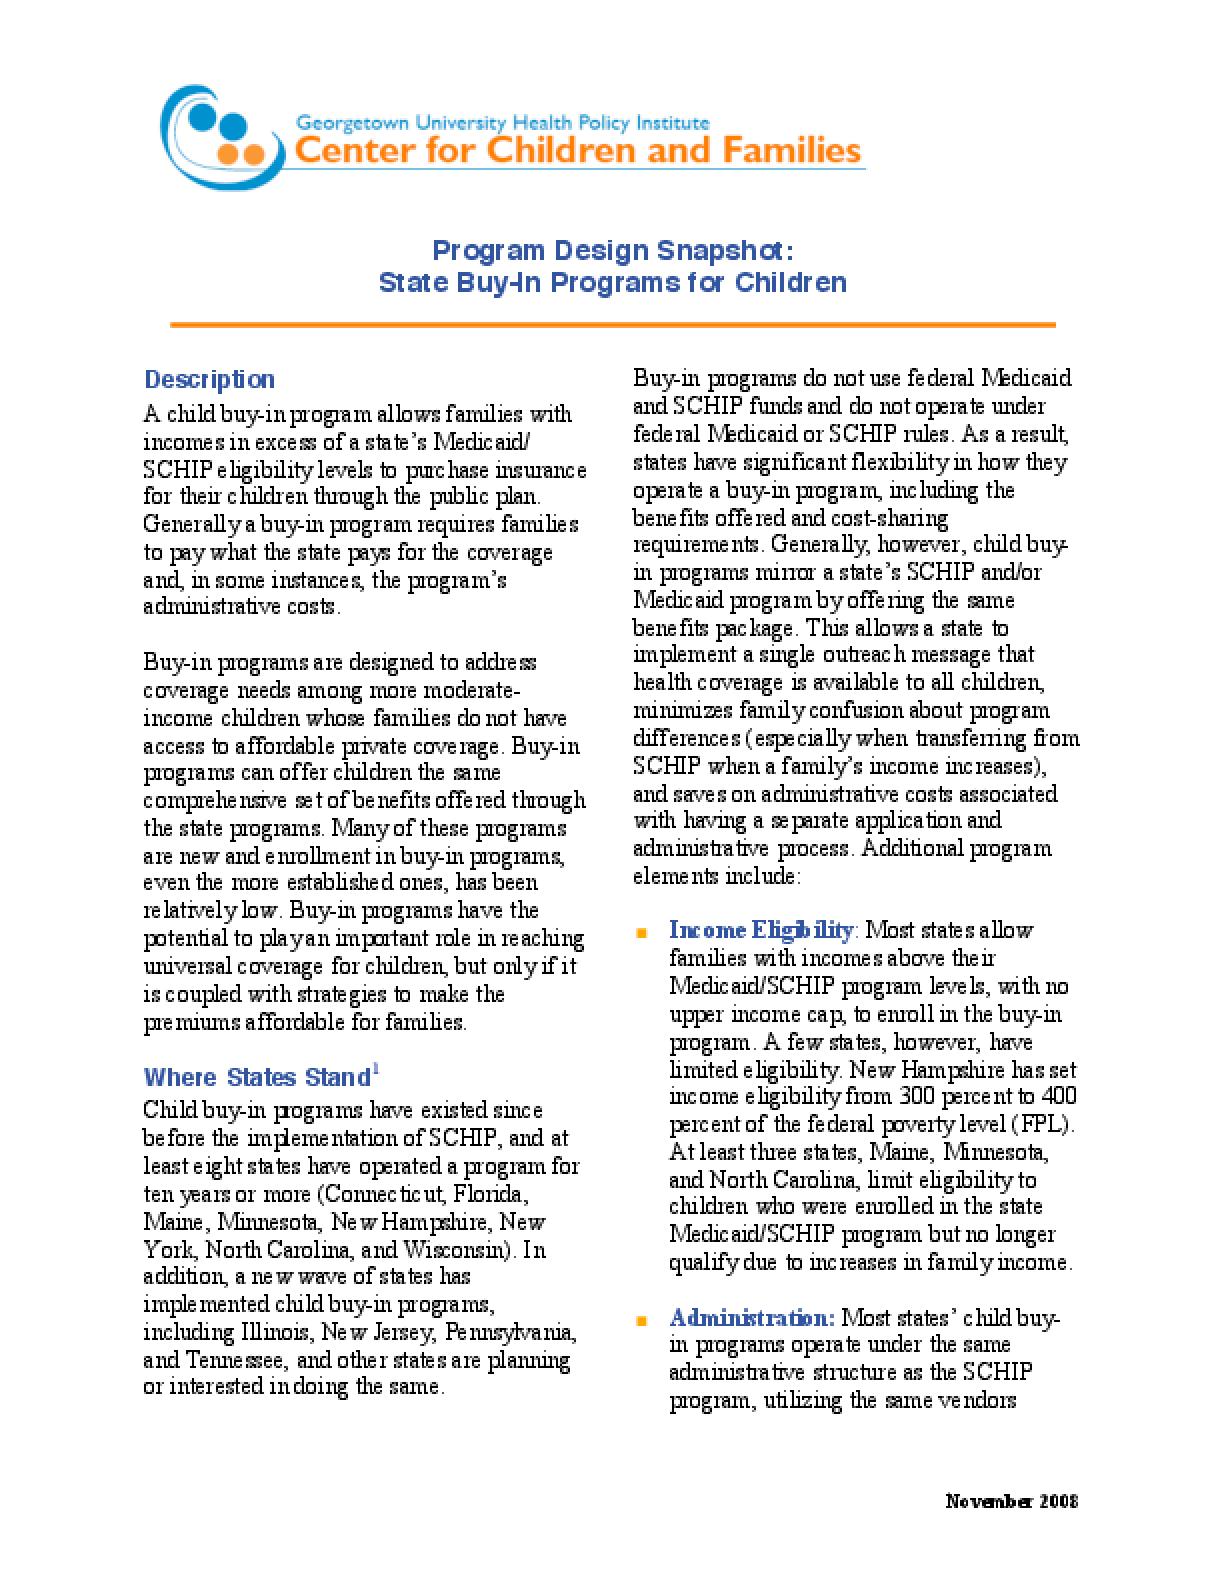 Program Design Snapshot: State Buy-In Programs for Children